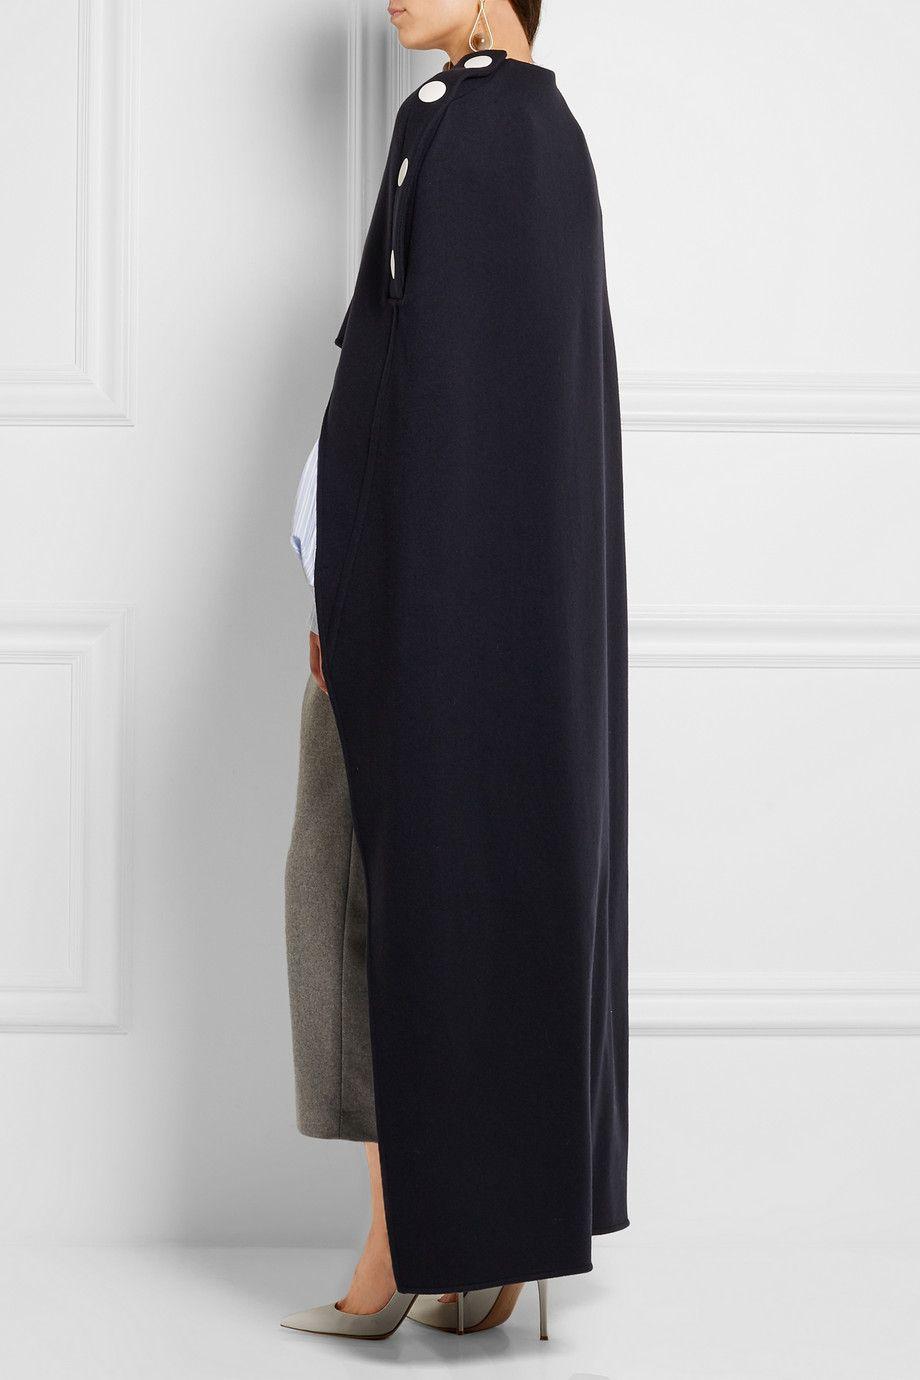 Marni | Draped wool cape | NET-A-PORTER.COM